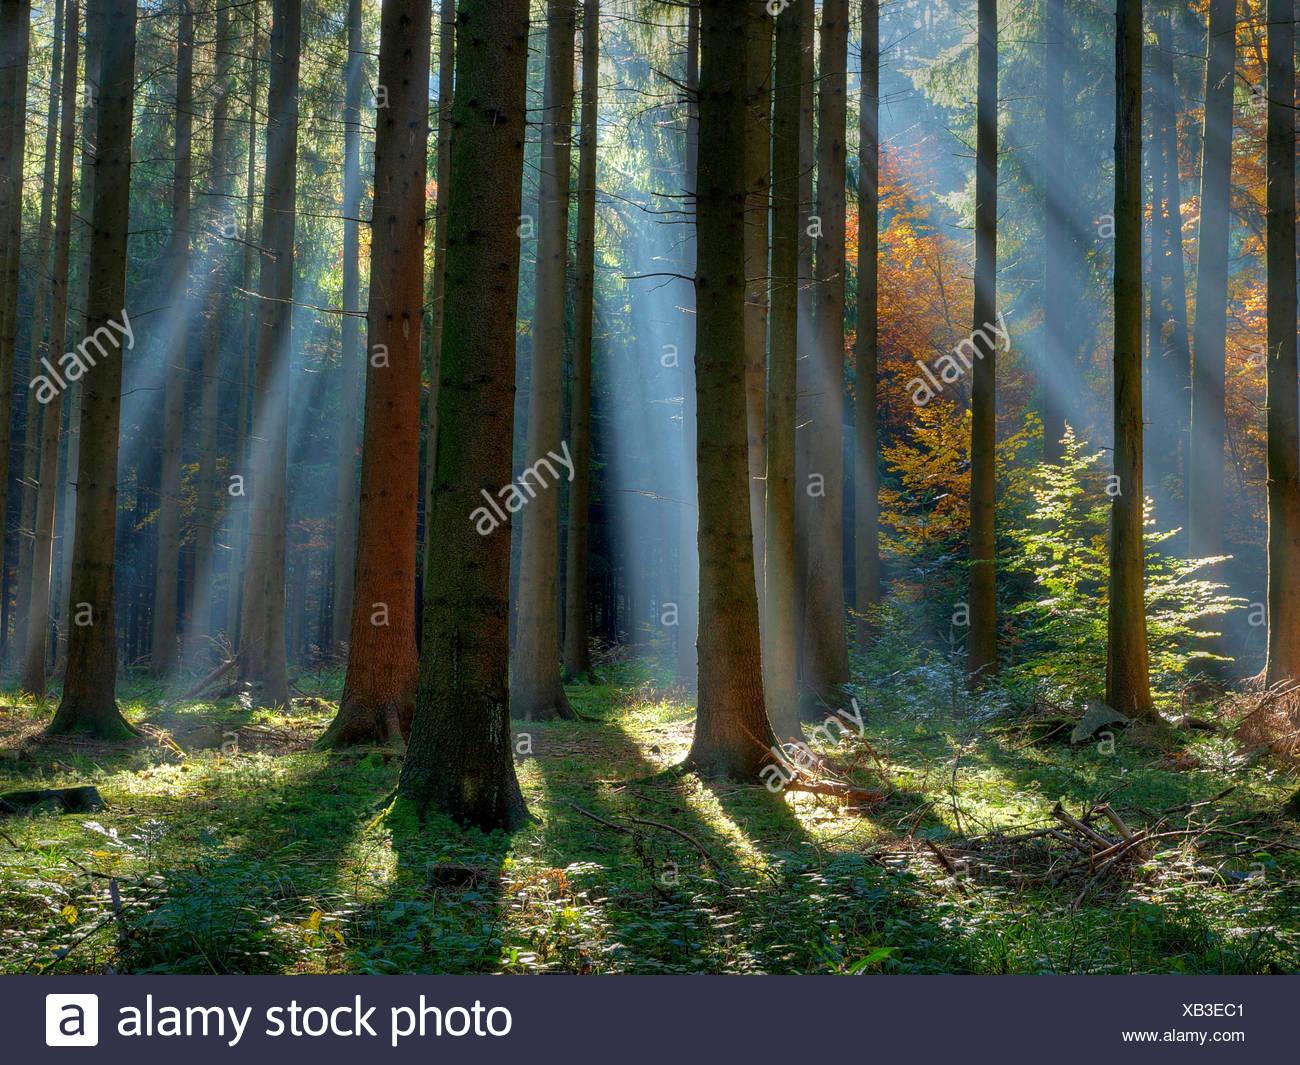 Autumn, sunrays, fir wood, Kusnacht, wood, forest, Switzerland, trunks, tribes, rays, beams, - Stock Image